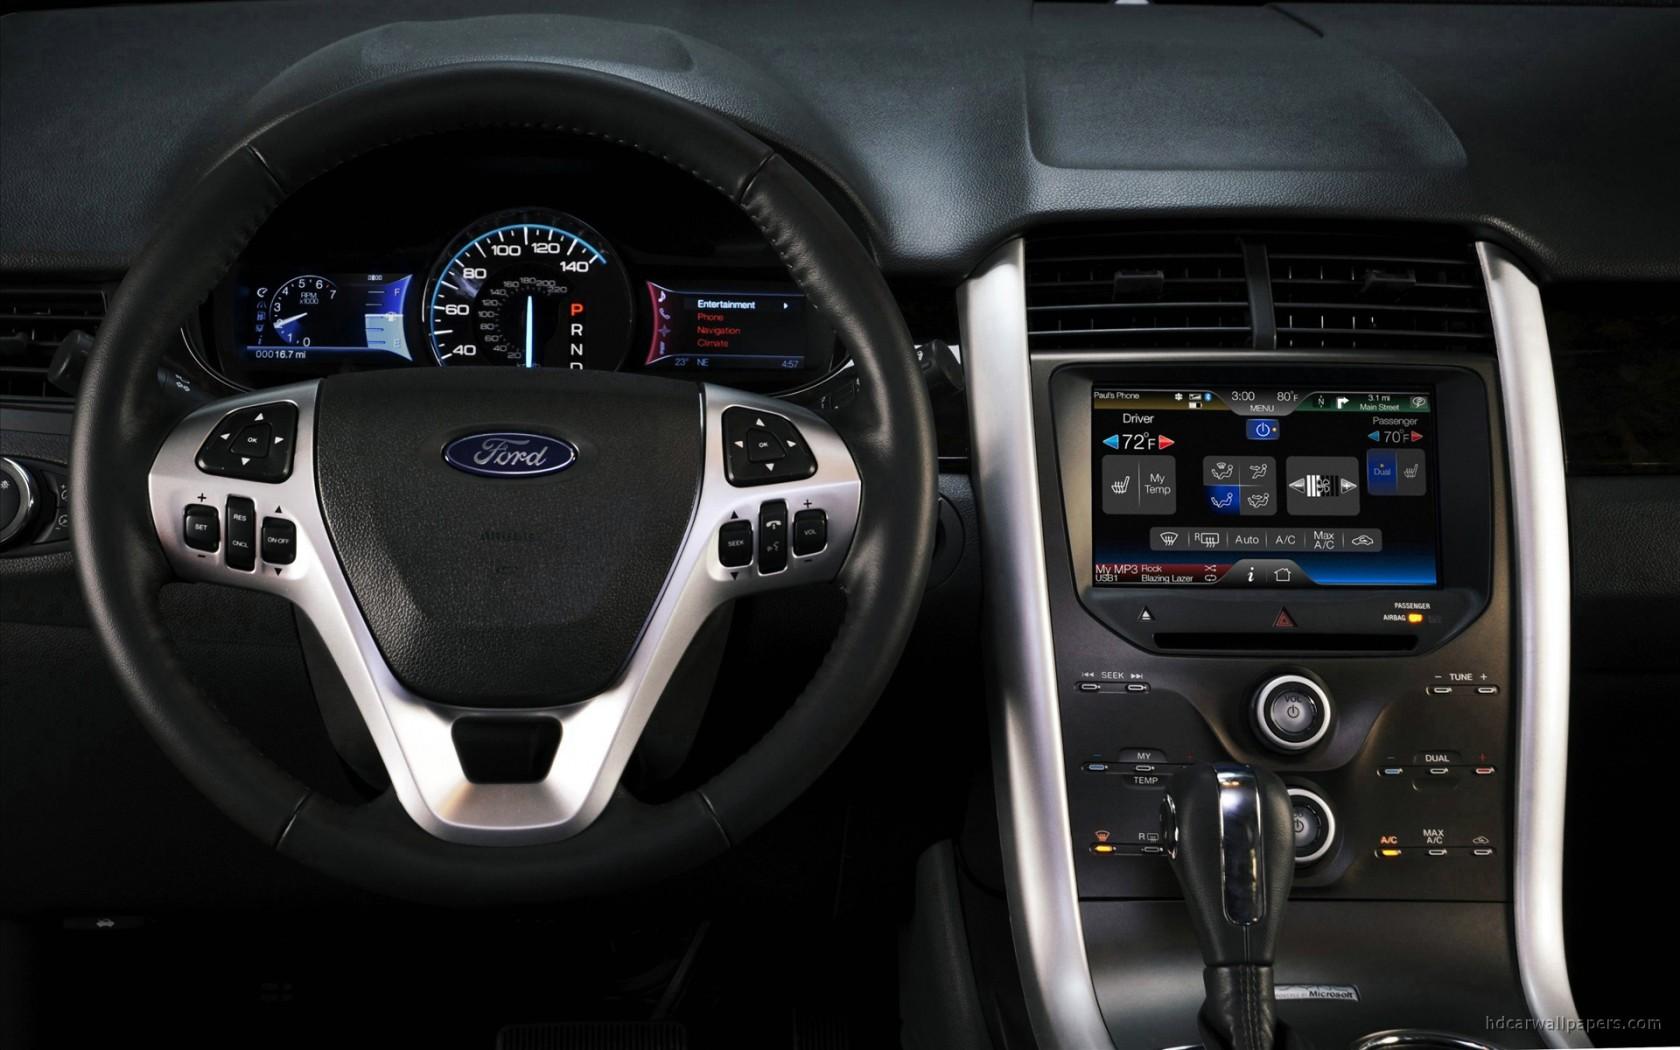 2011 Ford Edge Sport Interior Wallpaper  HD Car